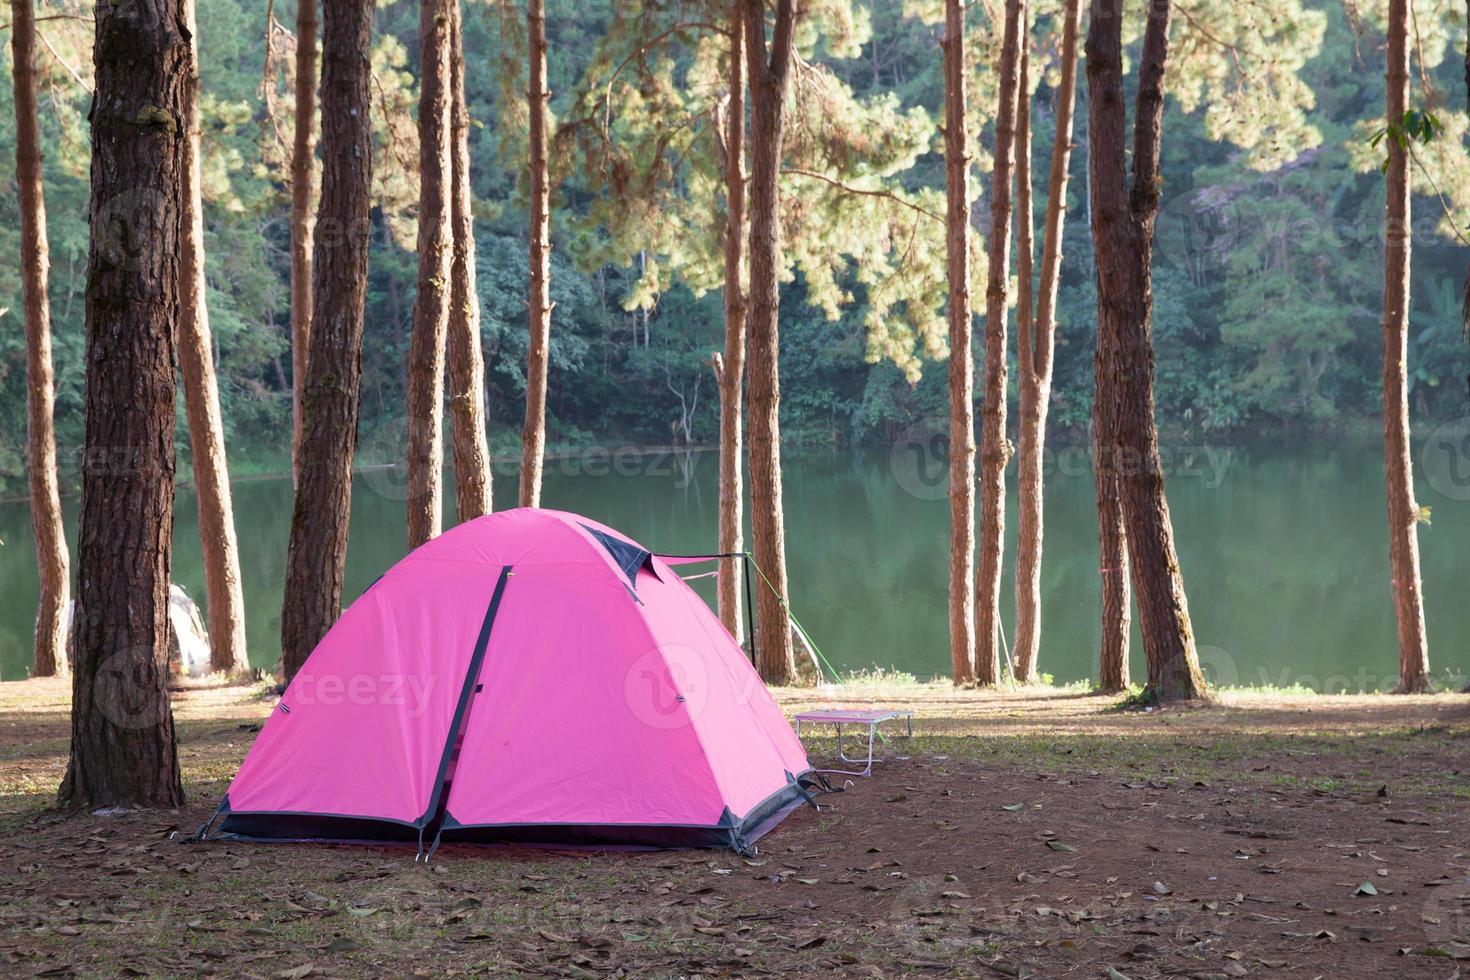 tente rose sur un terrain de camping photo